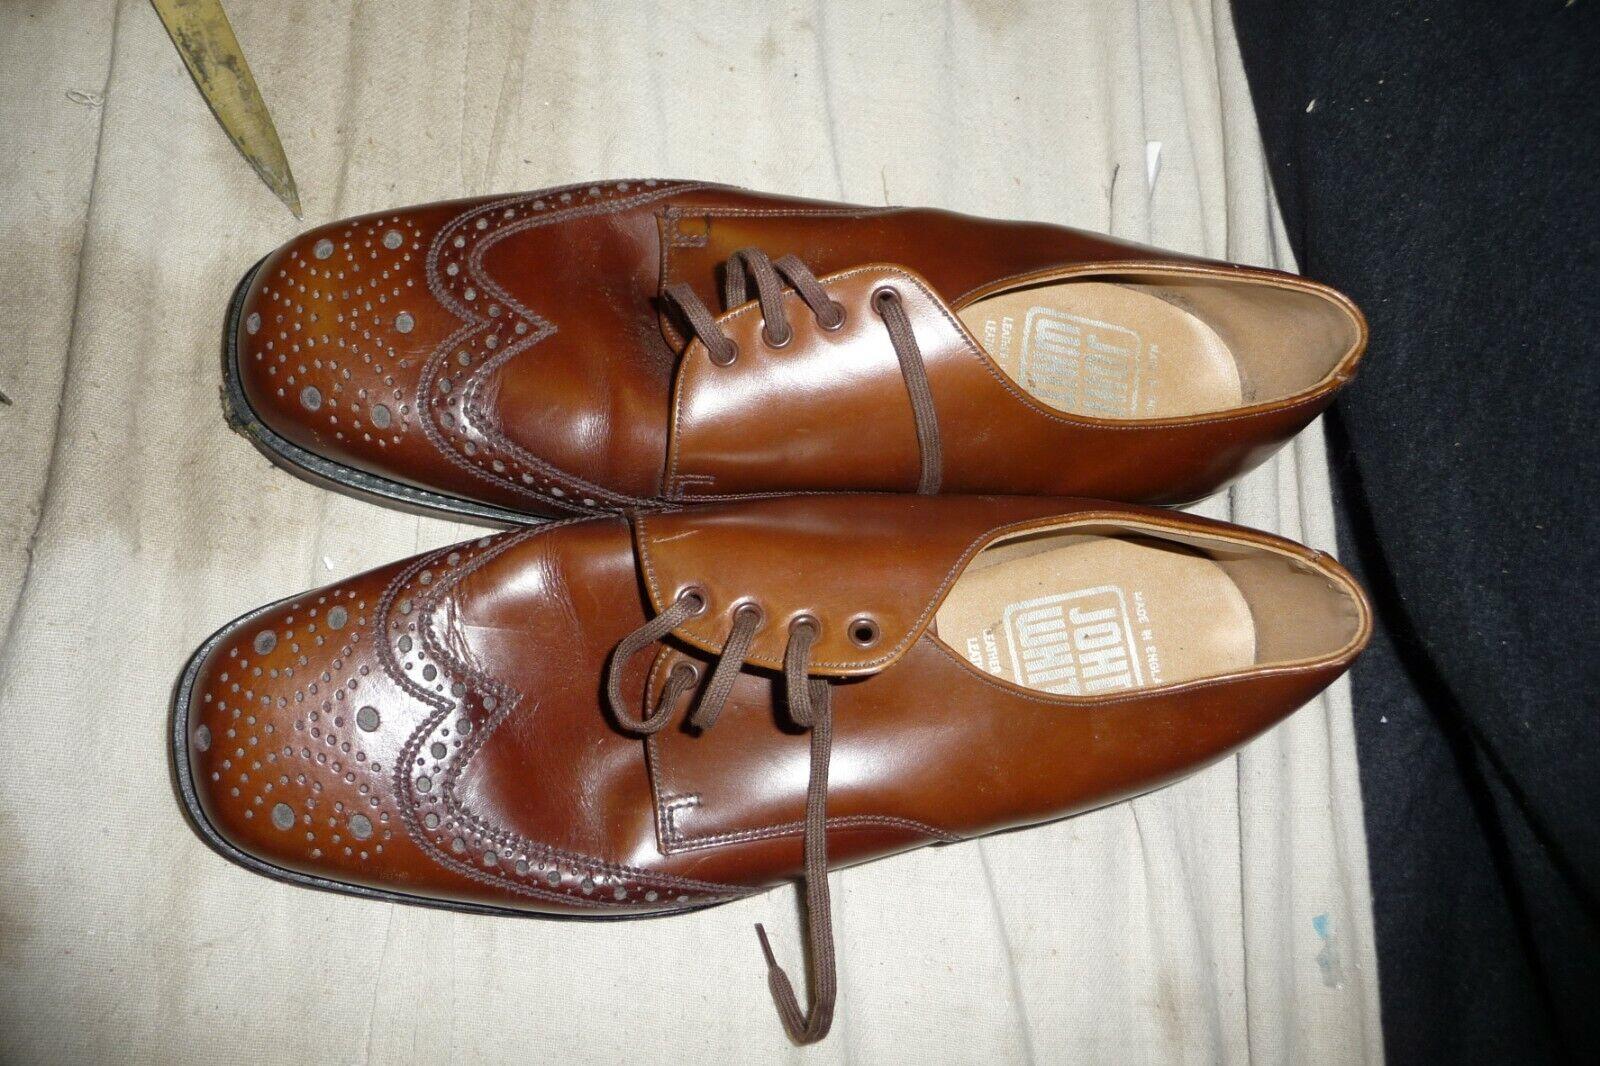 schuhe mens JOHN Weiß all leather braun Größe 9 brogue style